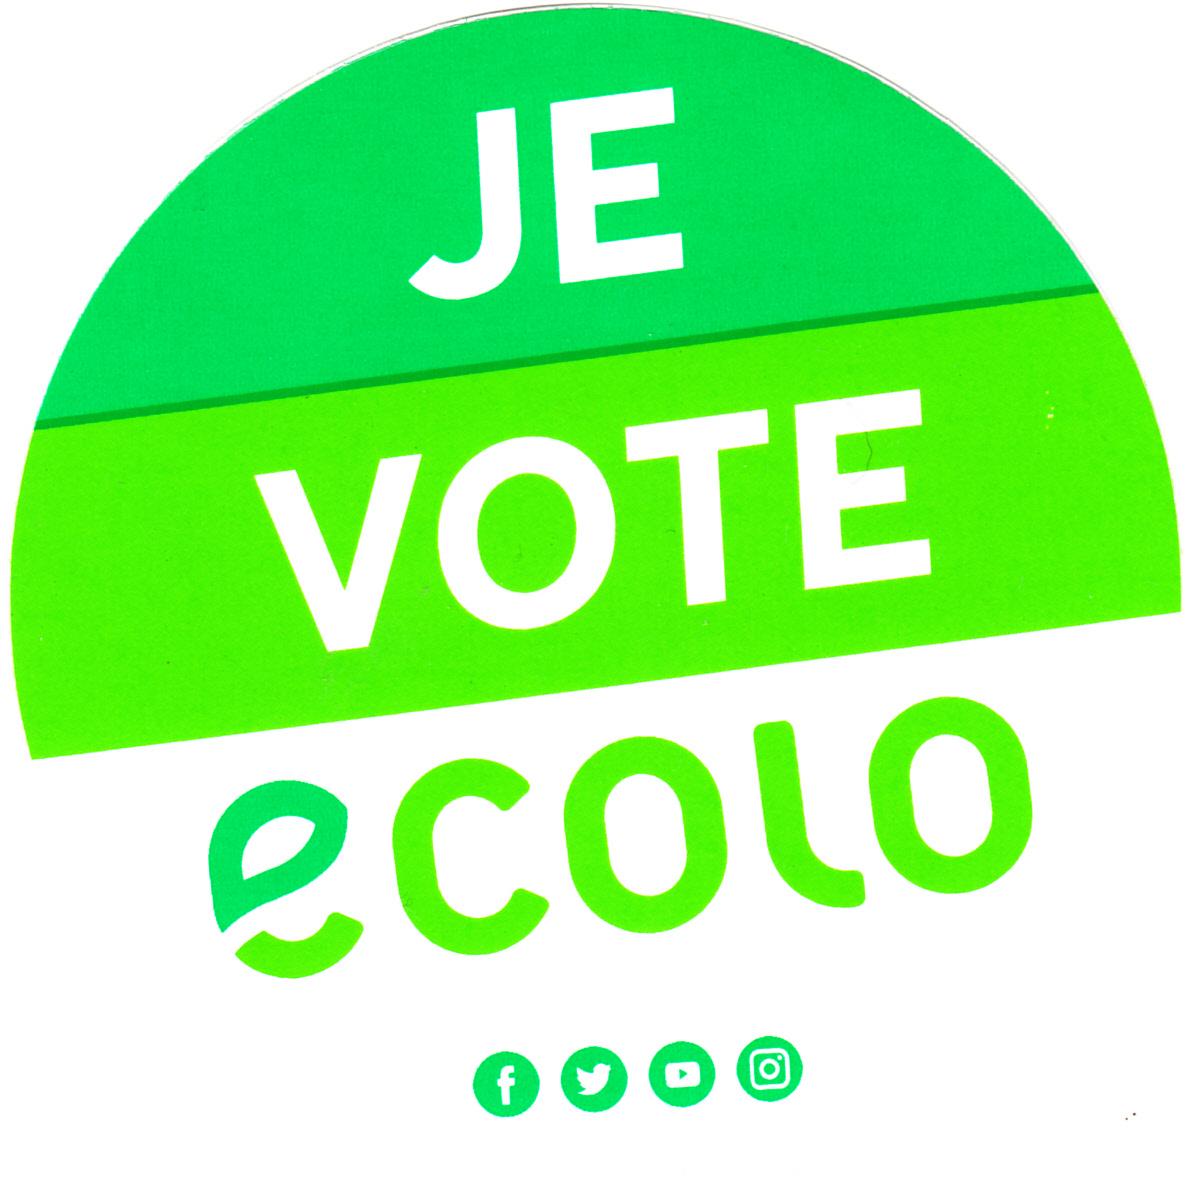 ECOLO_autoc